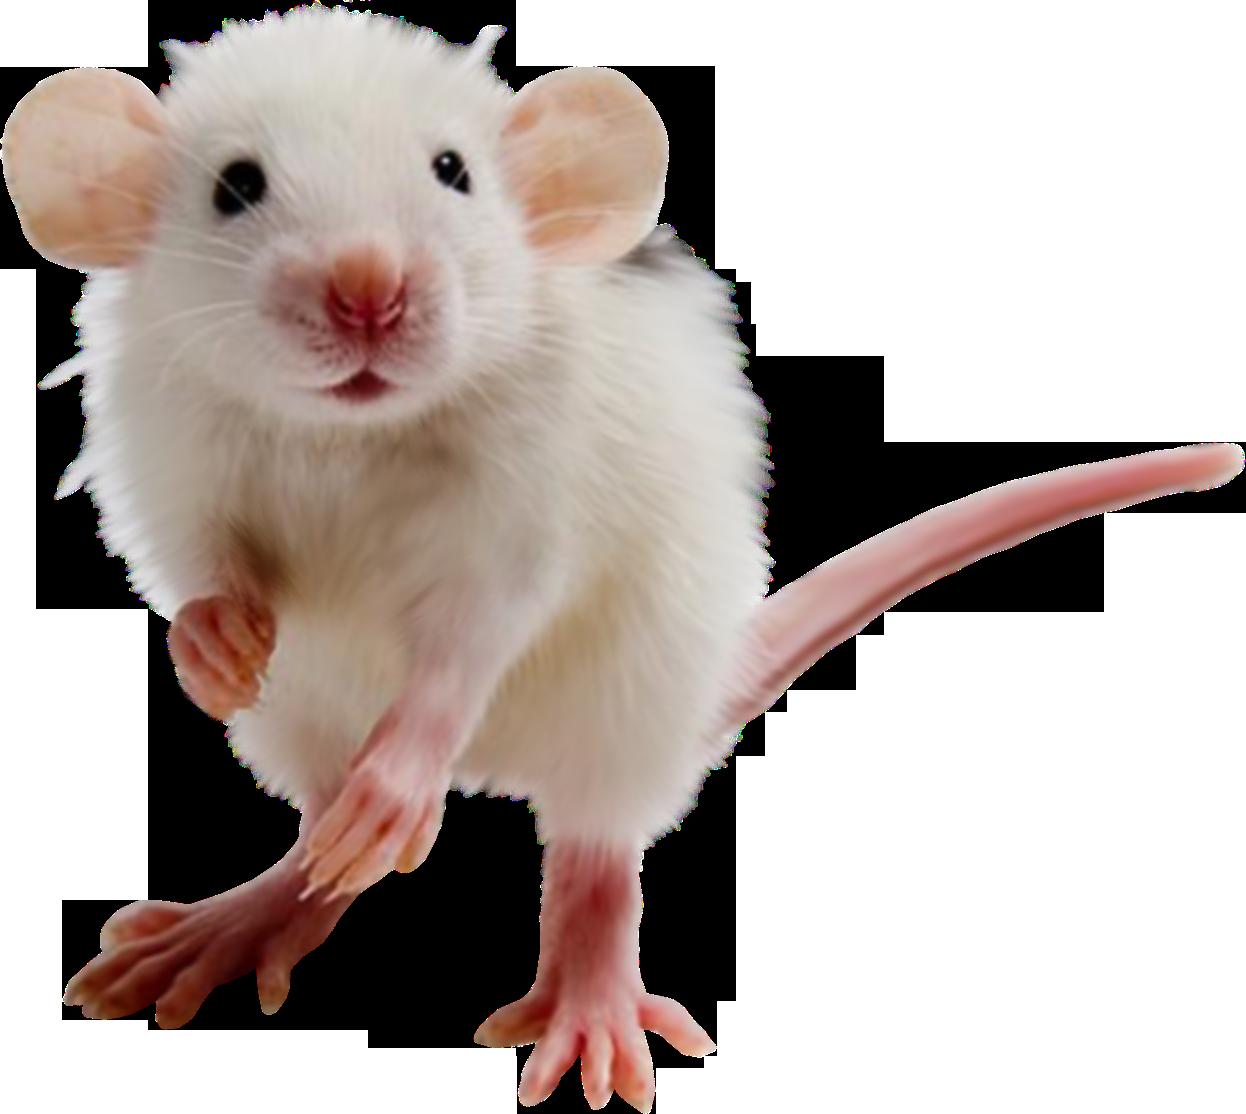 Hamster clipart transparent background. Mouse rat png image